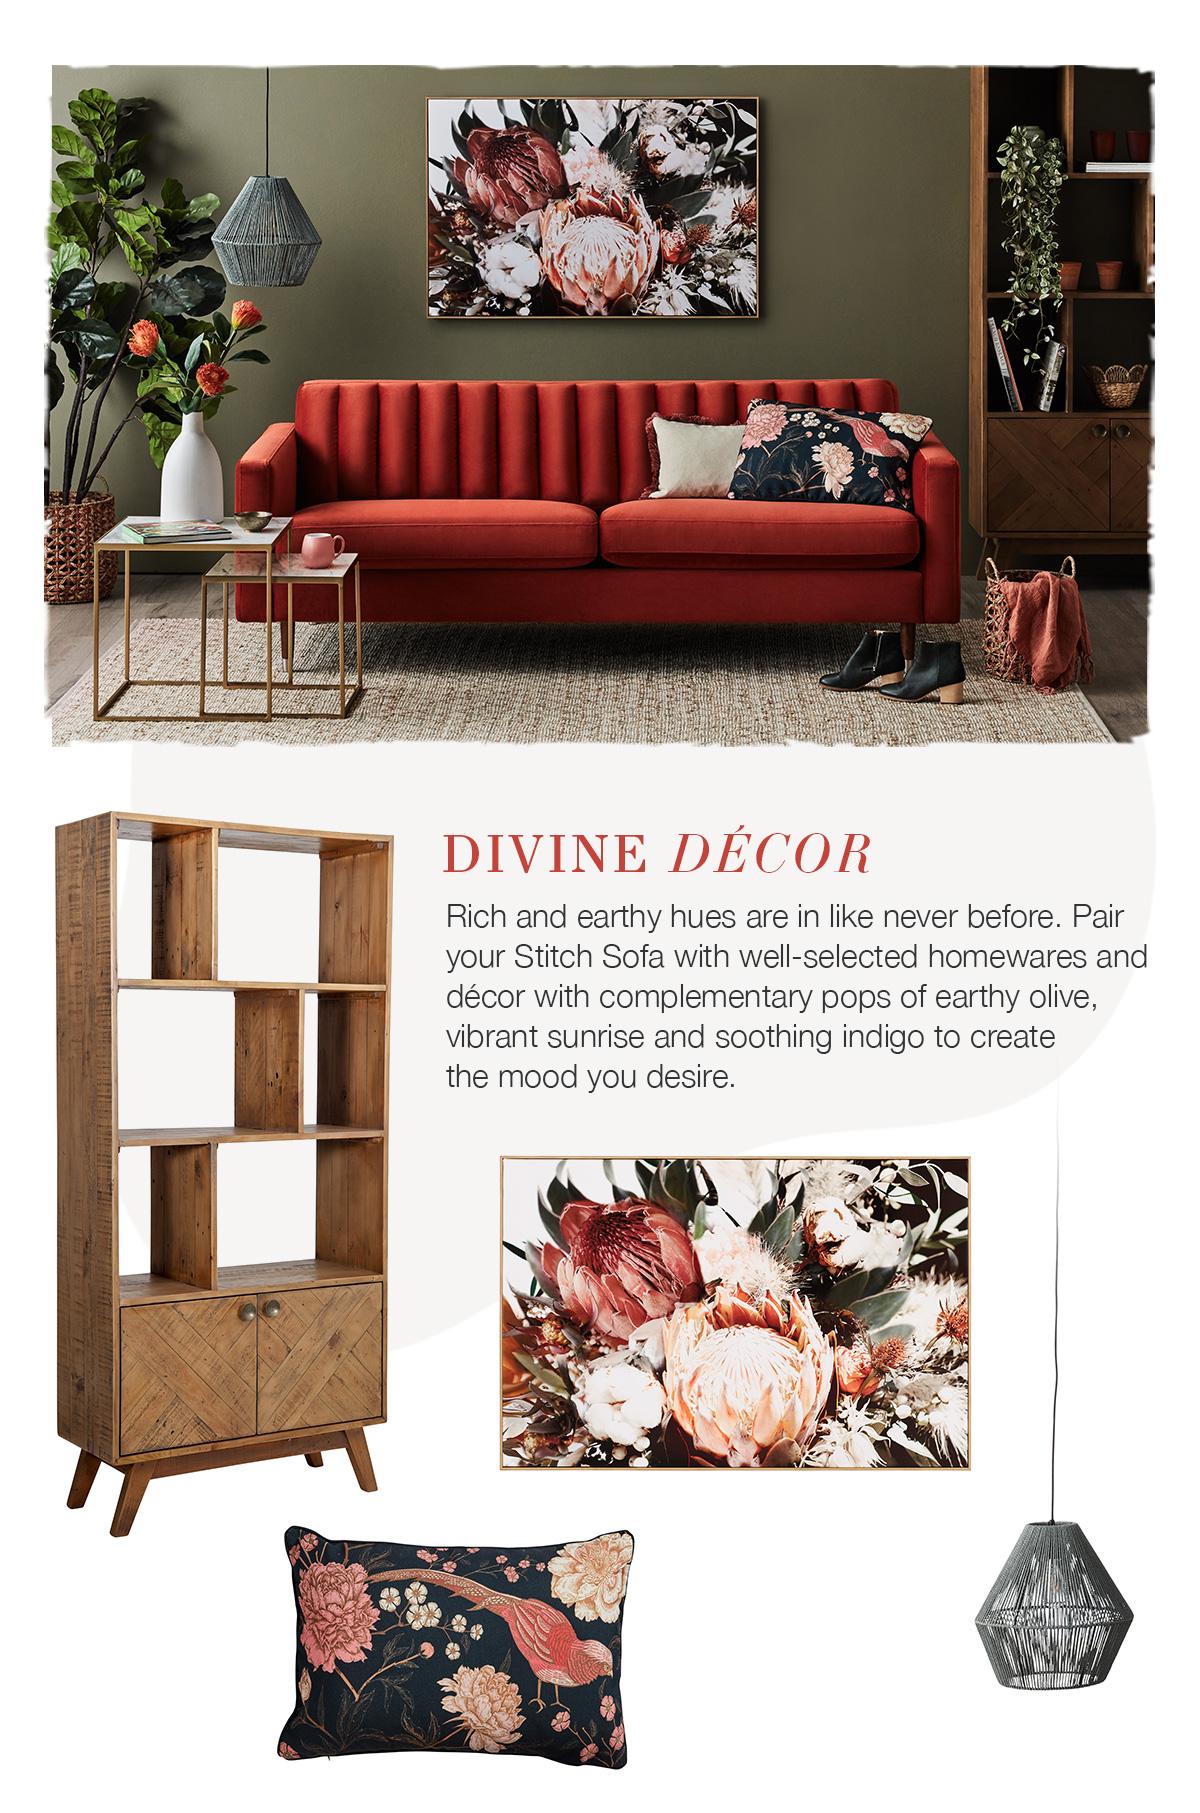 Up the Luxe with the Stitch Velvet Sofa - sunrise orange velvet sofa